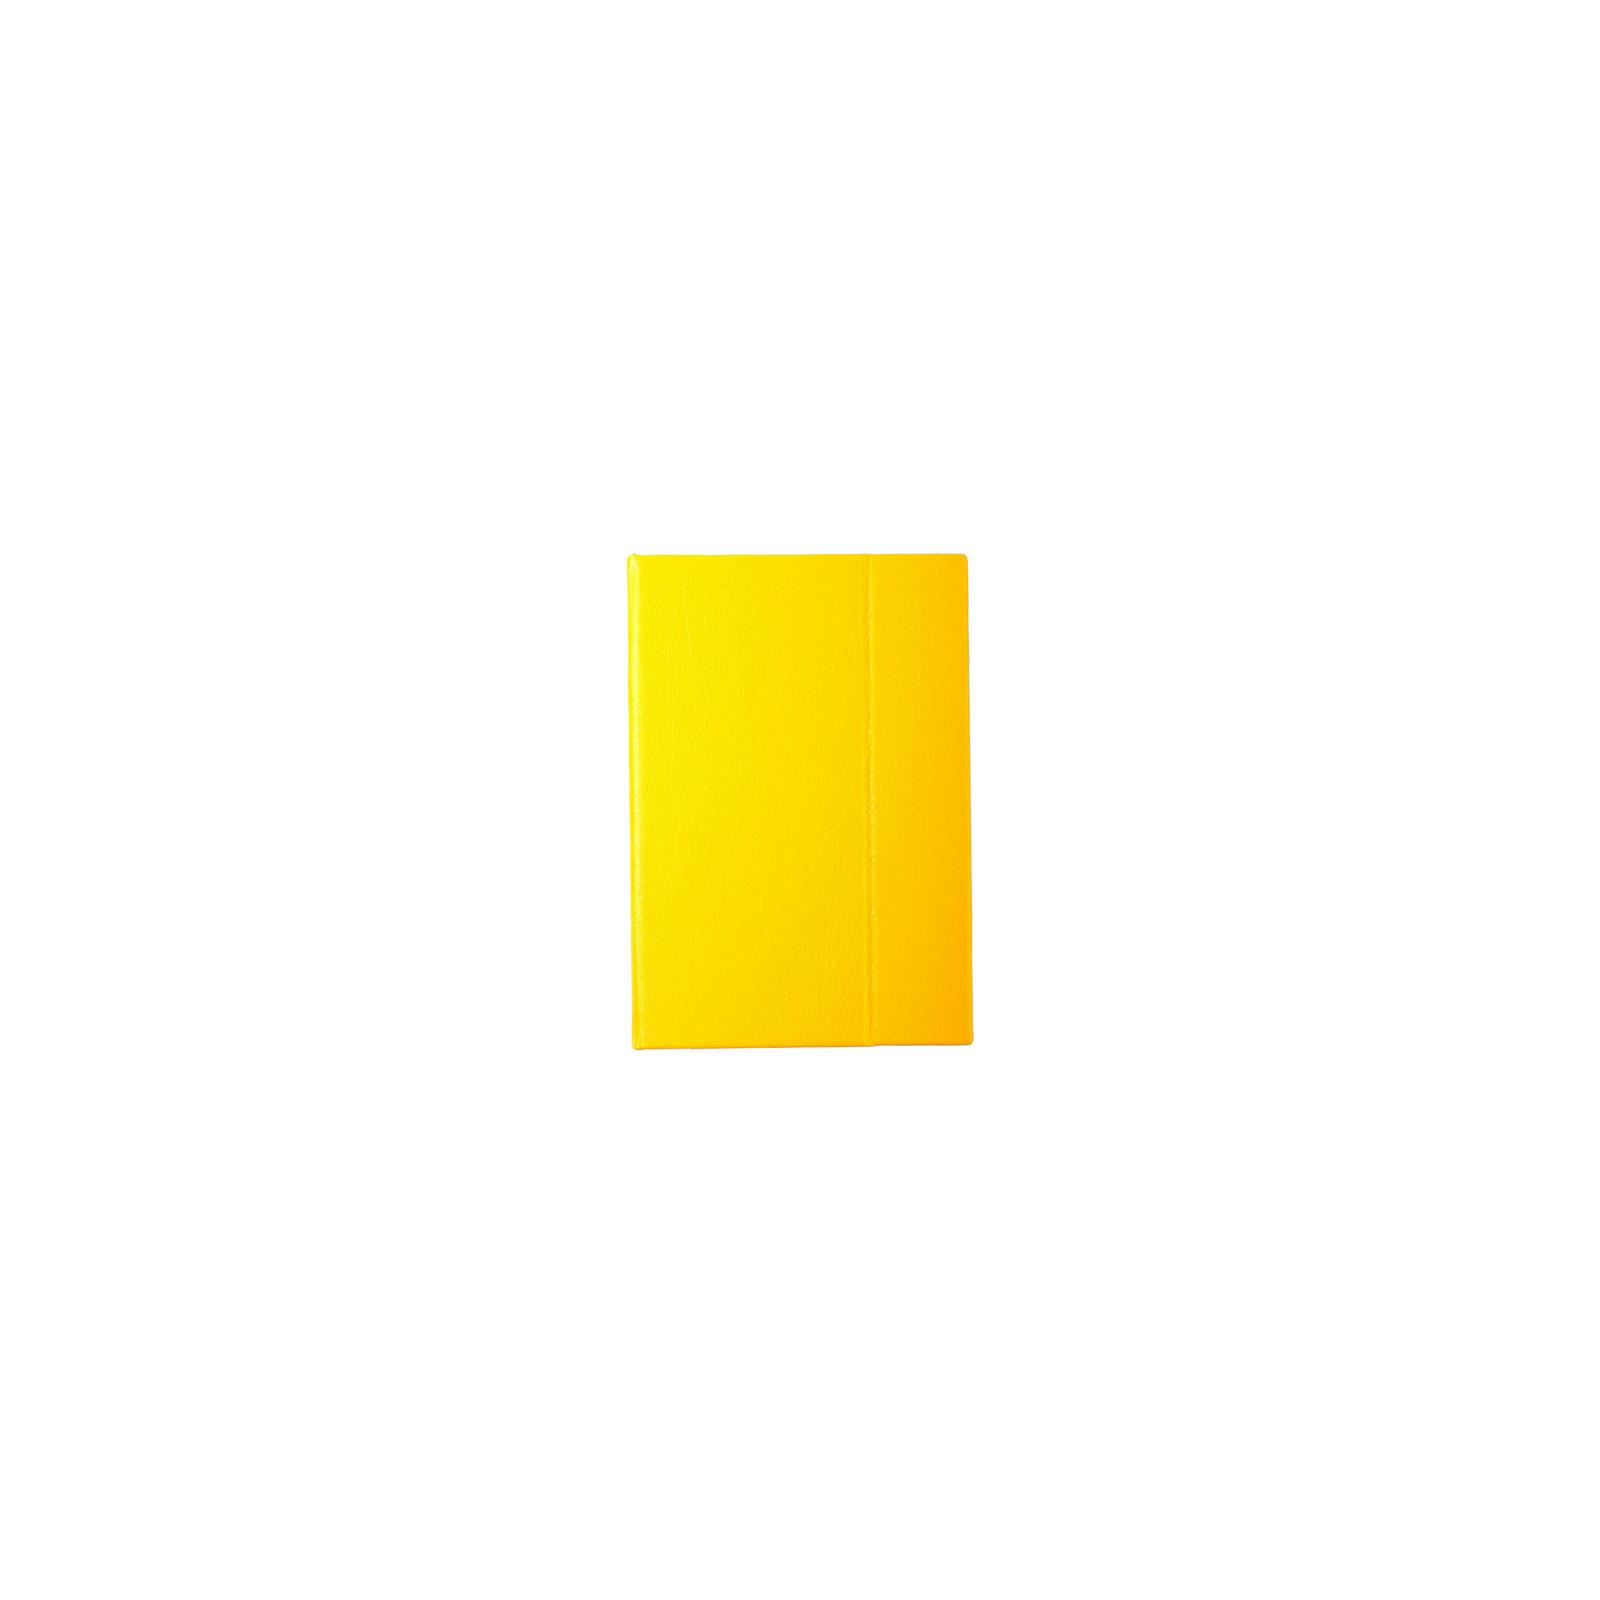 Чехол для планшета Vento 9.7 Desire Bright -yellow изображение 2